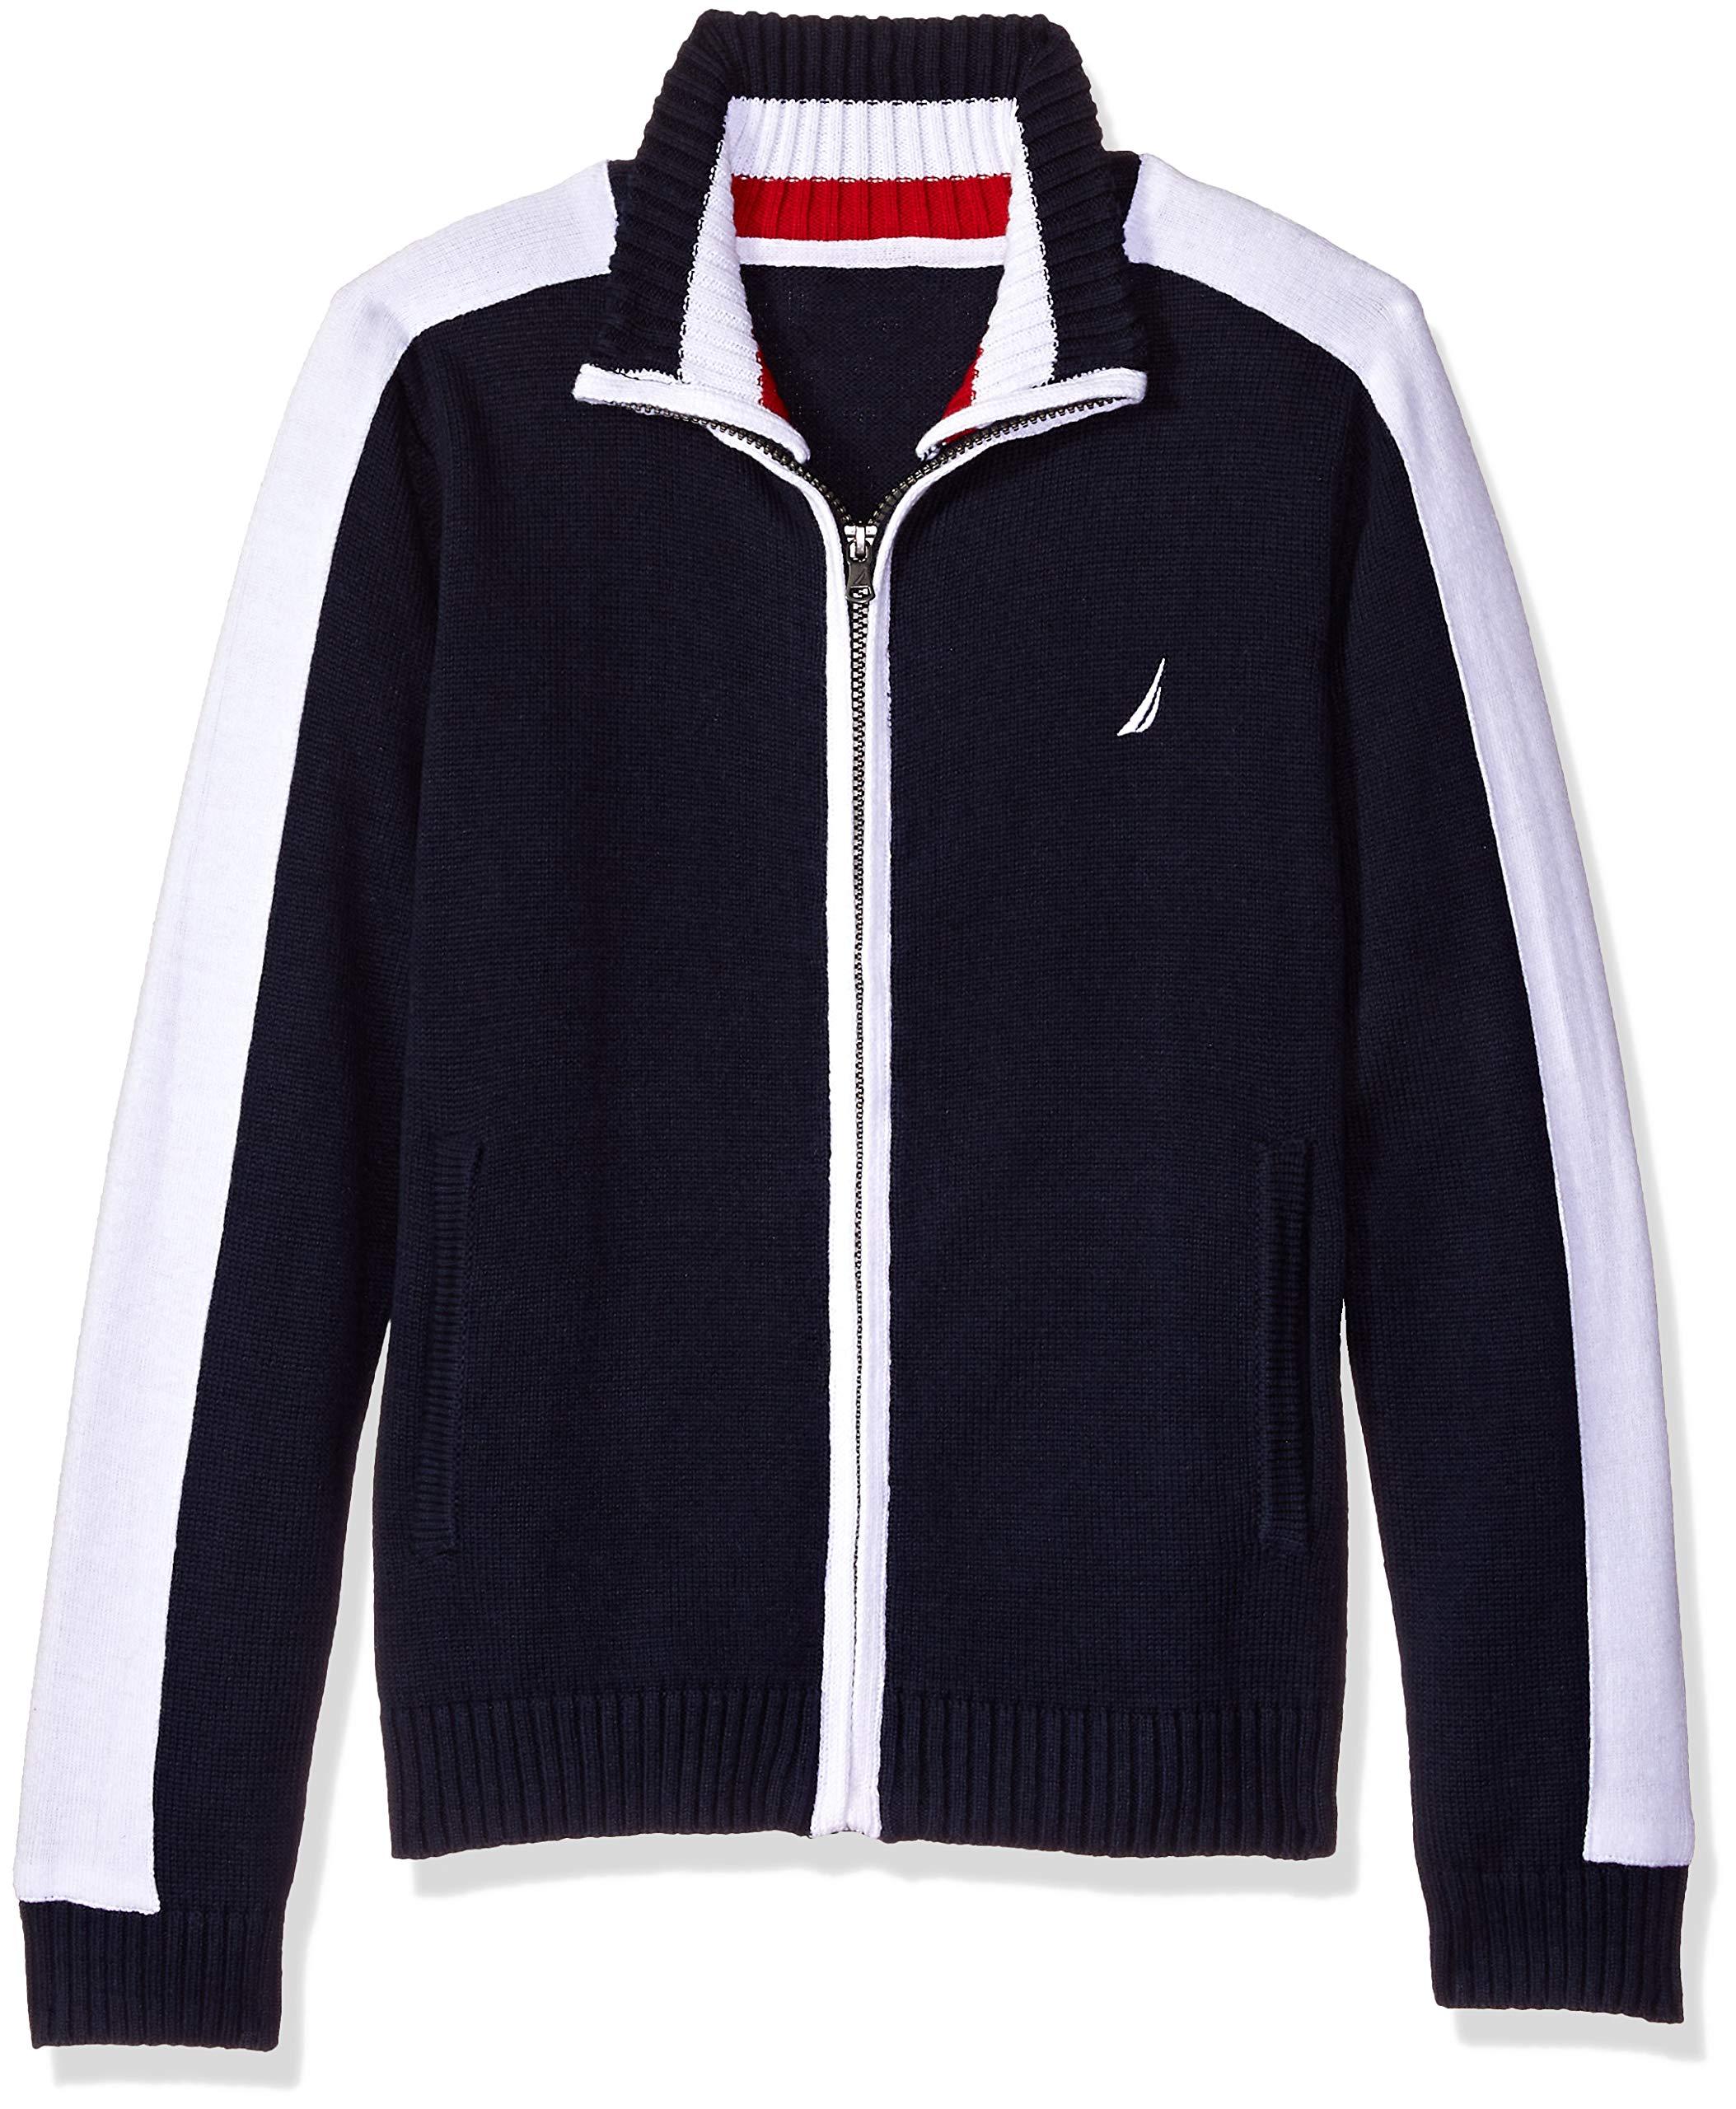 Nautica Boys' Little Textured Block Stripe Full Zip Sweater, Yawl Sport Navy 5